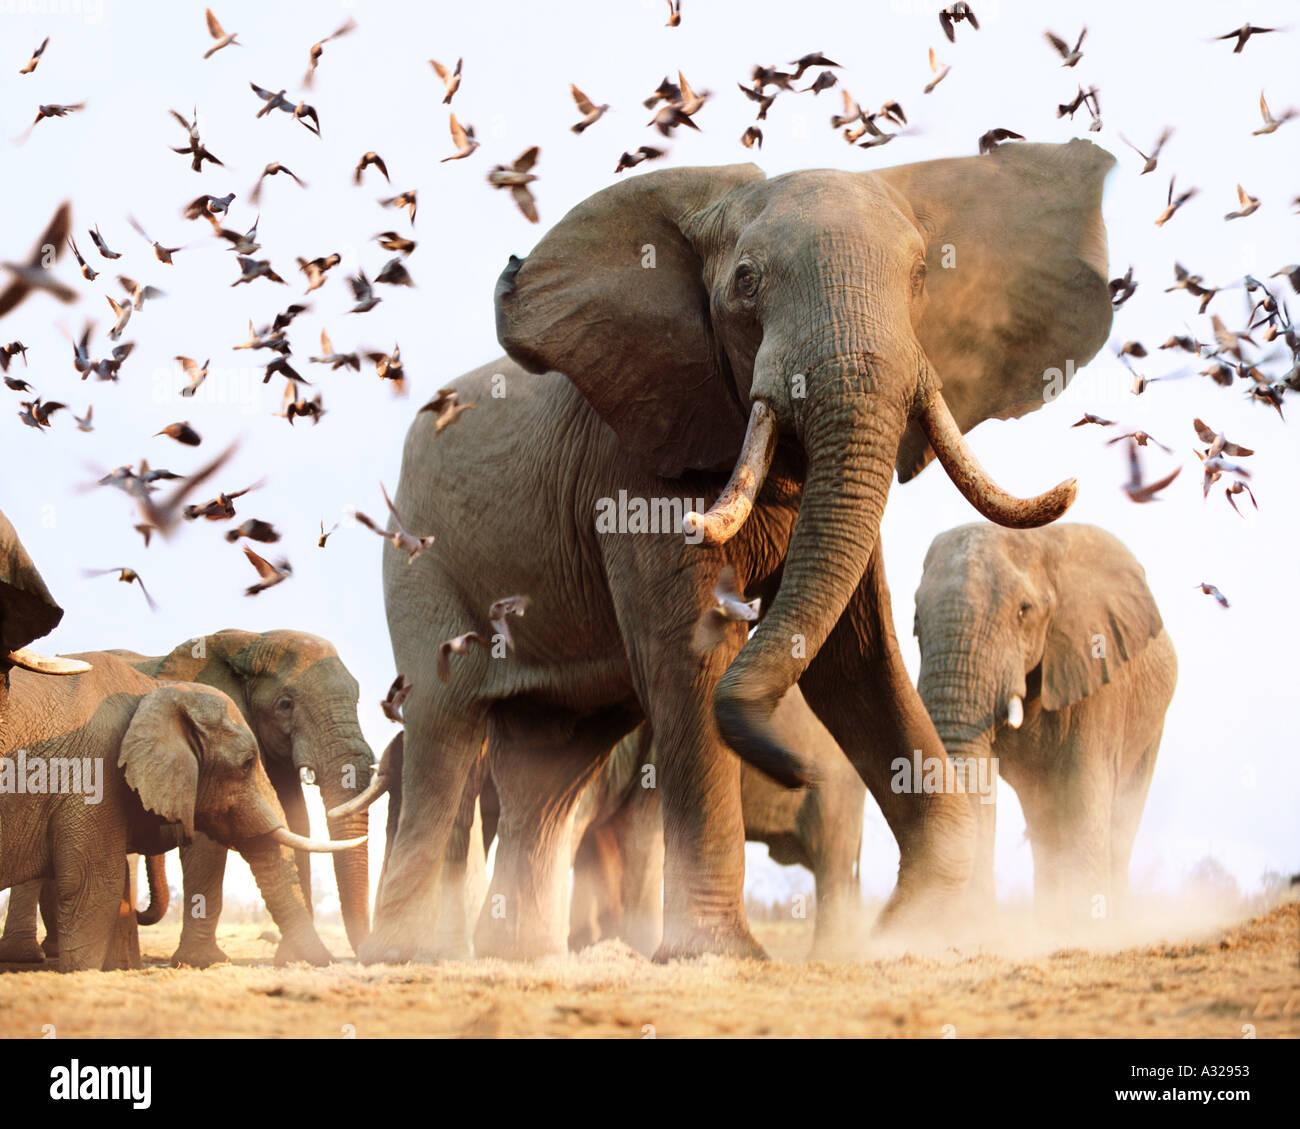 Gli elefanti africani inquietante stormo di uccelli Savuti Botswana Immagini Stock